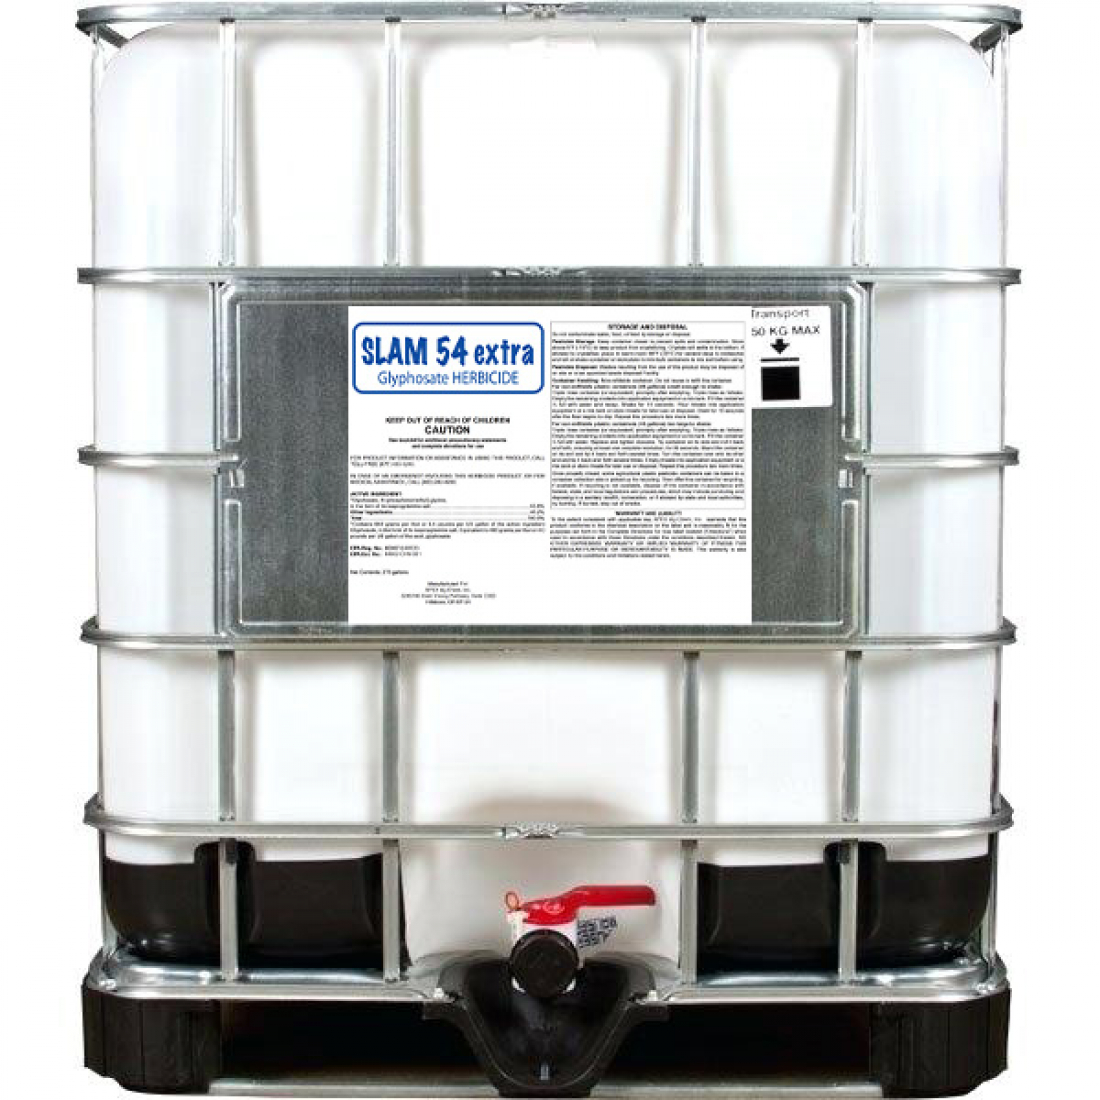 SLAM 54 Glyphosate